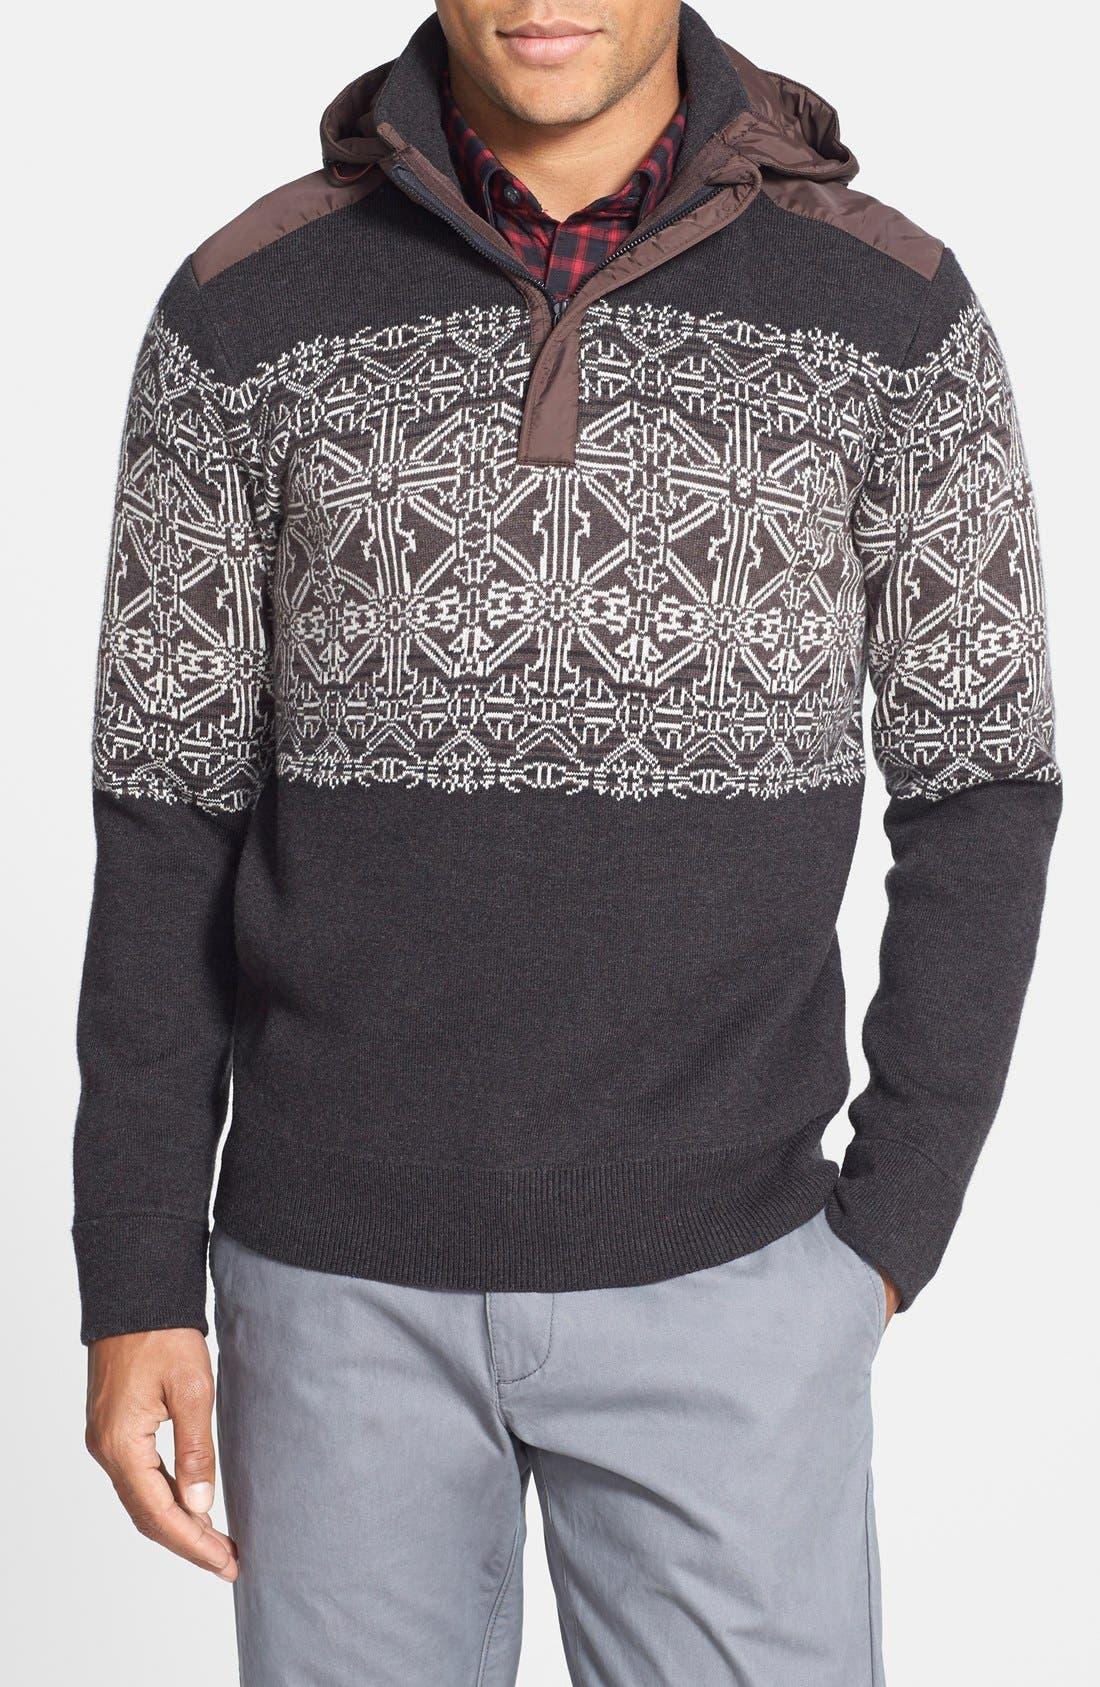 Victorinox Swiss Army® 'Fair Isle' Tailored Fit Half Zip Sweater ...